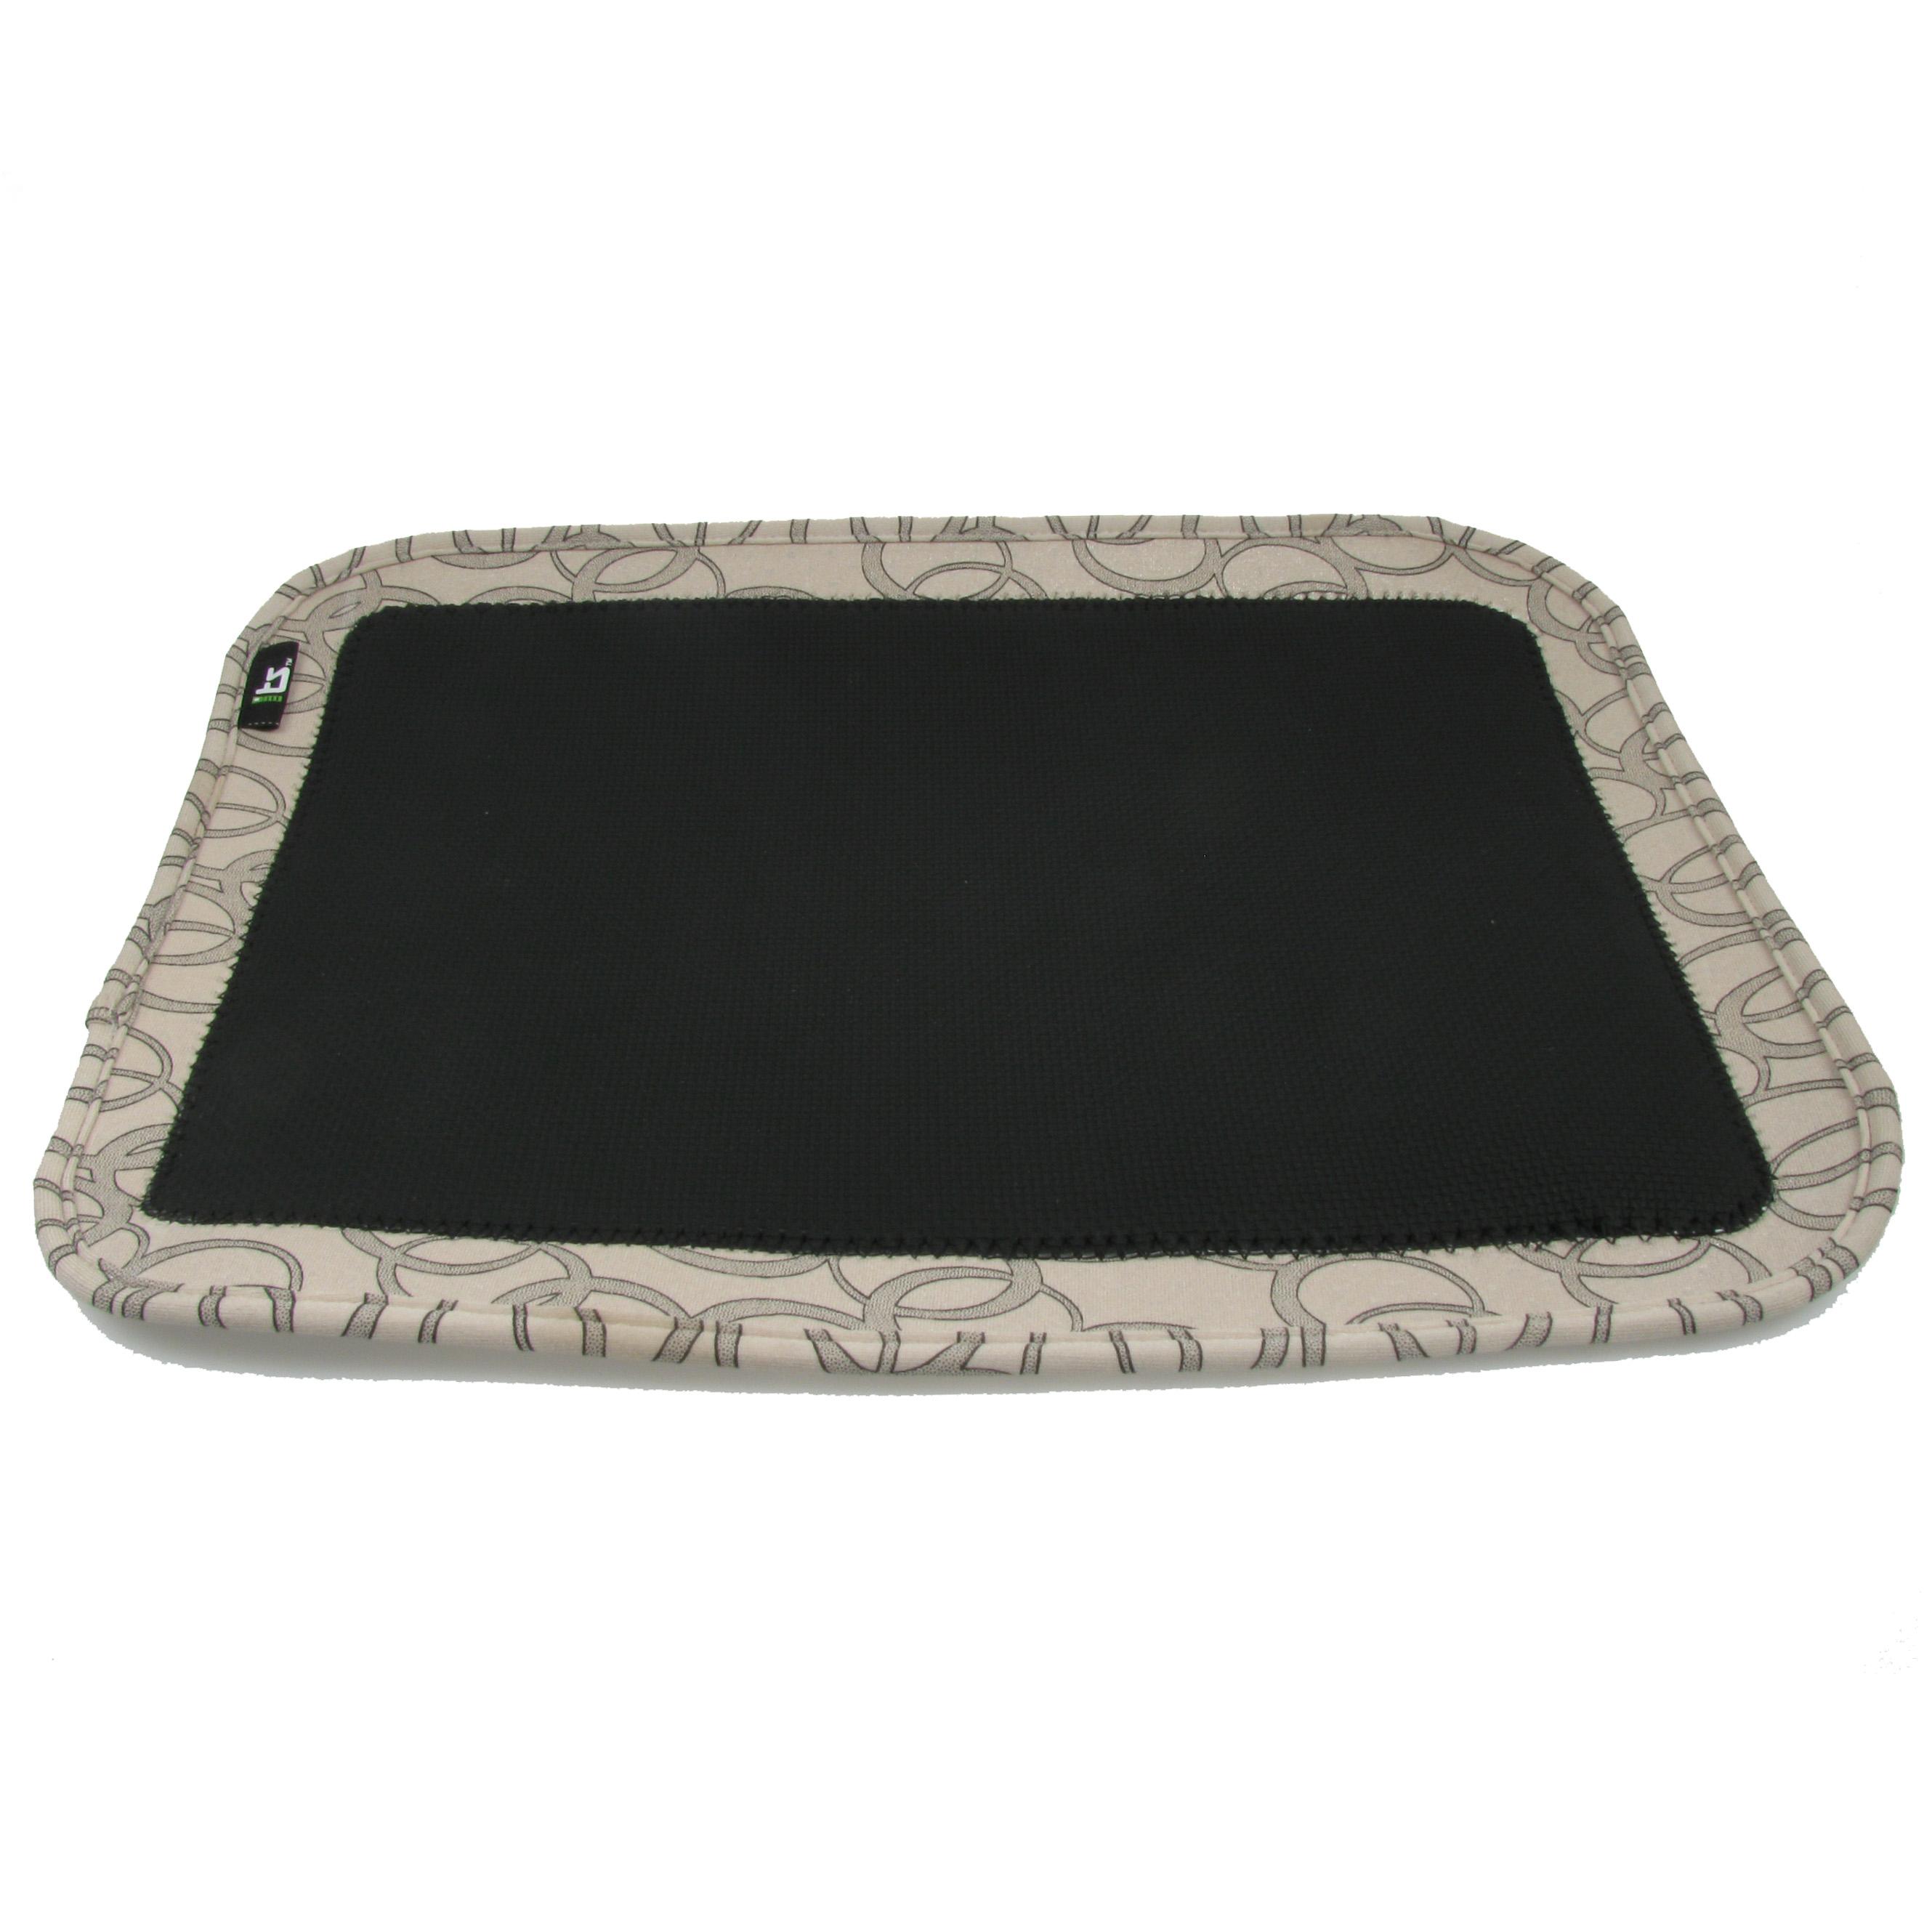 mats bombora brewing gear aerial resistant grey smokey heat scales acaia mat